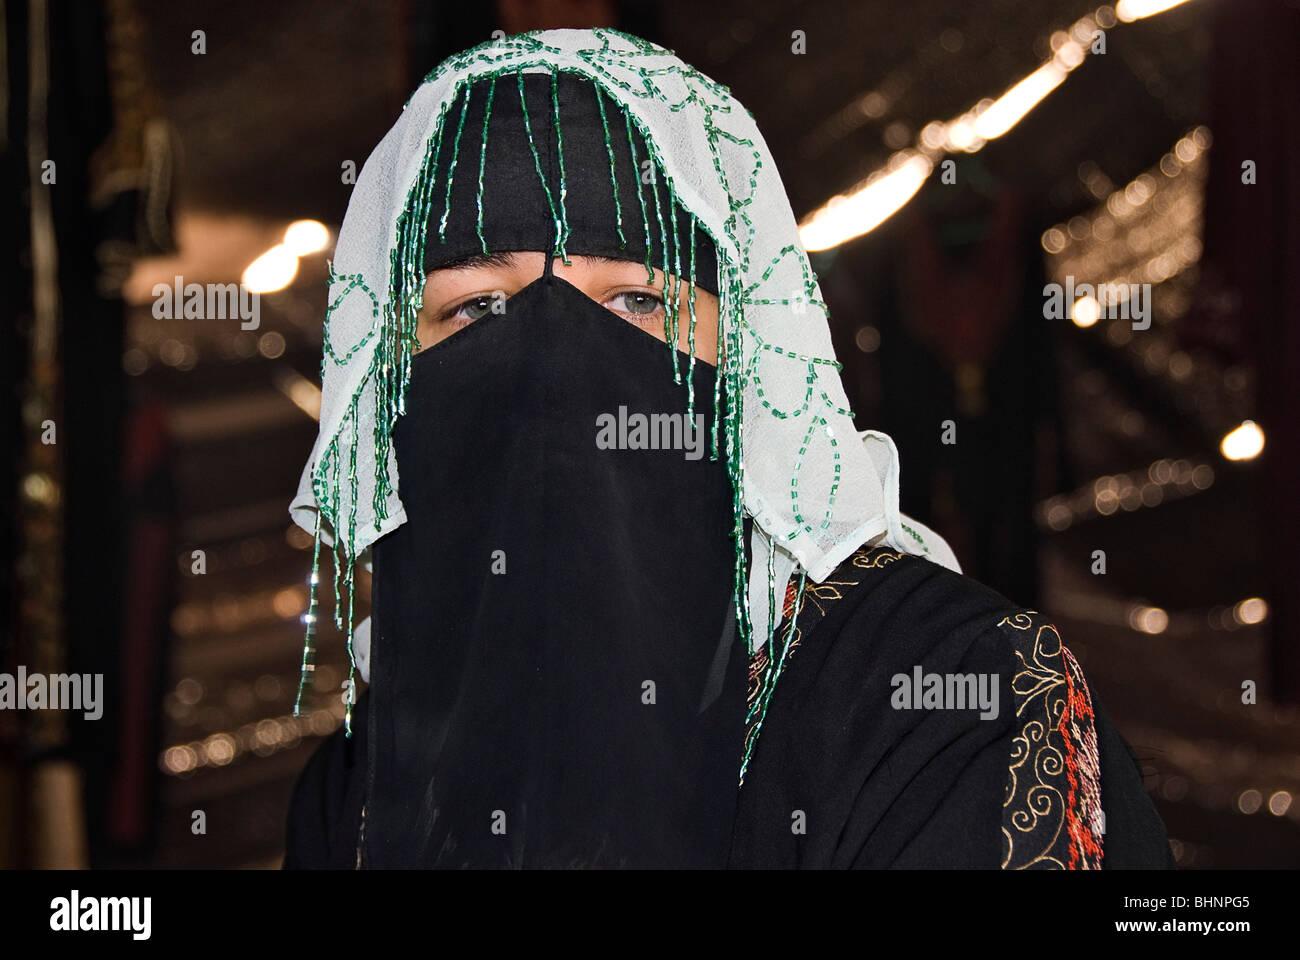 Woman dress with traditional arabic clothes inside a jaima, Wadi Rum, Jordan, Asia. - Stock Image